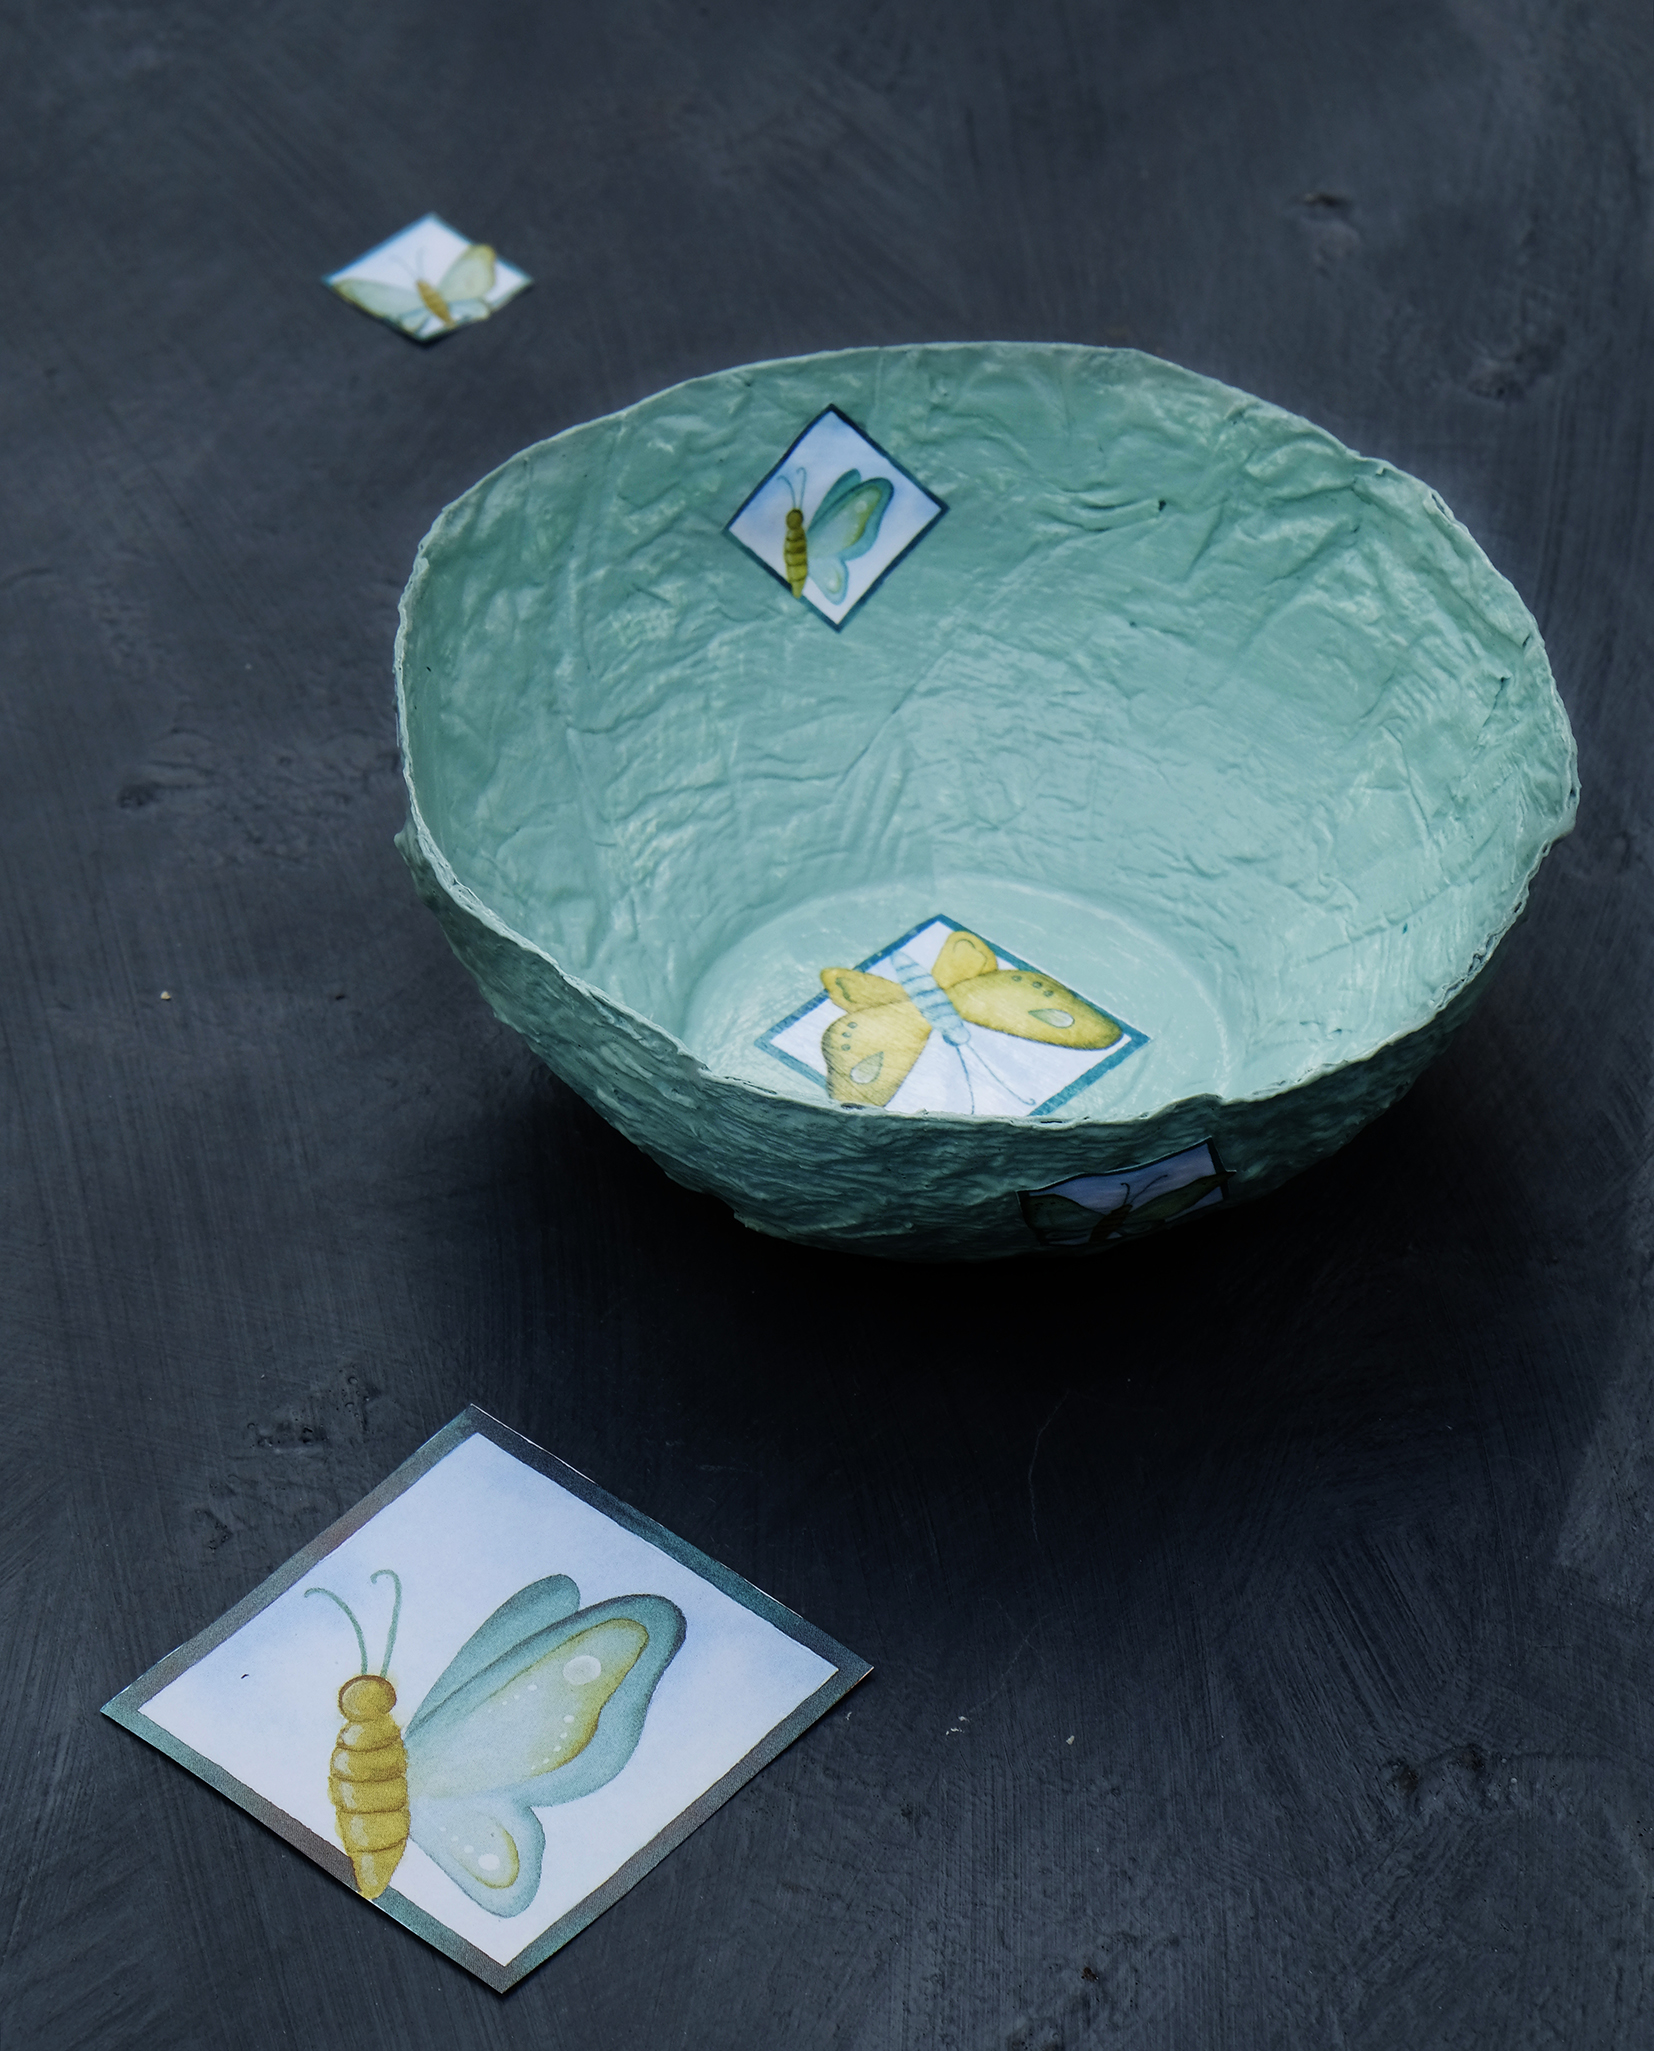 Papier Mâché decoratie schaaltjes maken